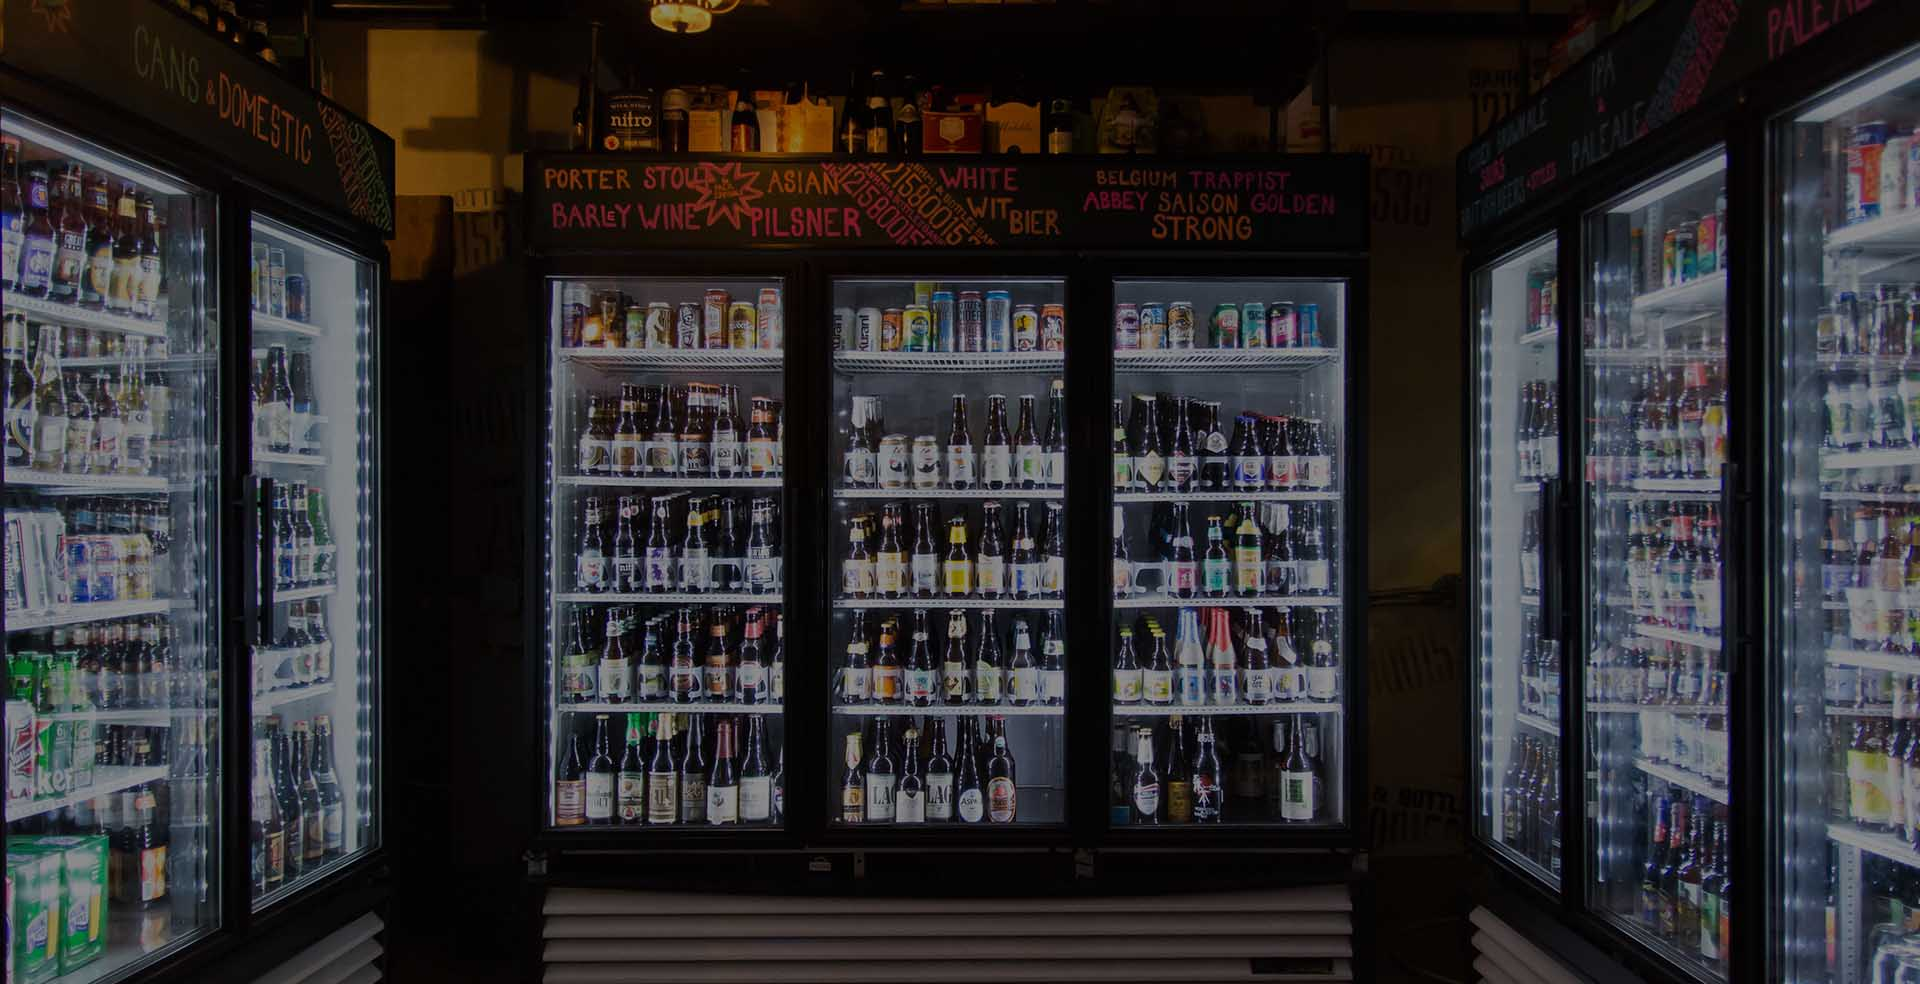 Over 200 craft beer bottles